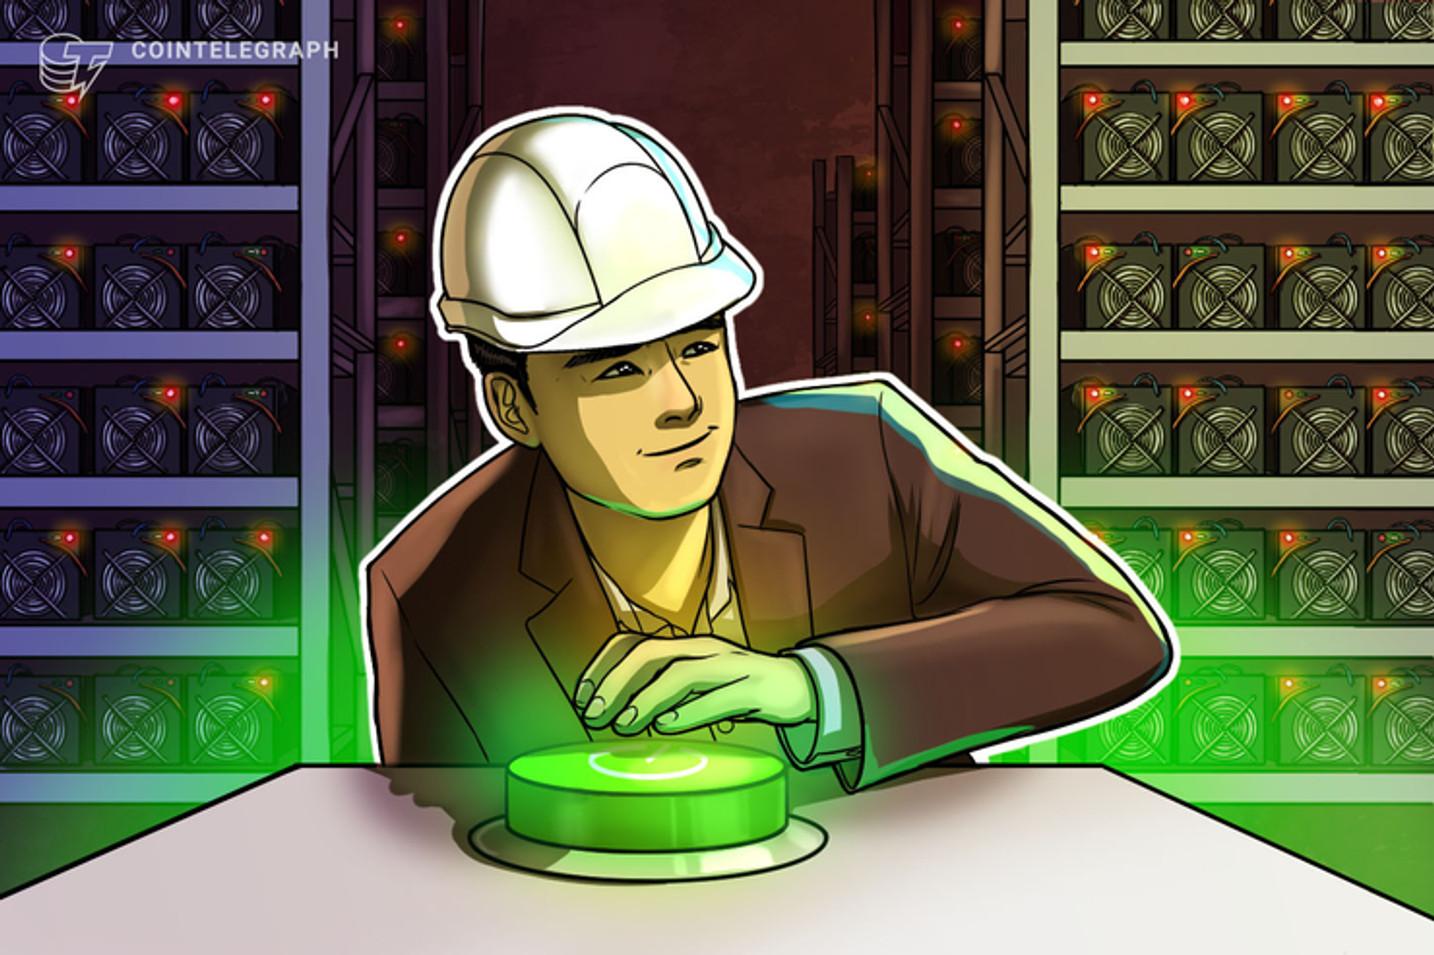 Exclusivo: Coronavírus chega a Sichuan e pode afetar indústria de mineração de Bitcoin